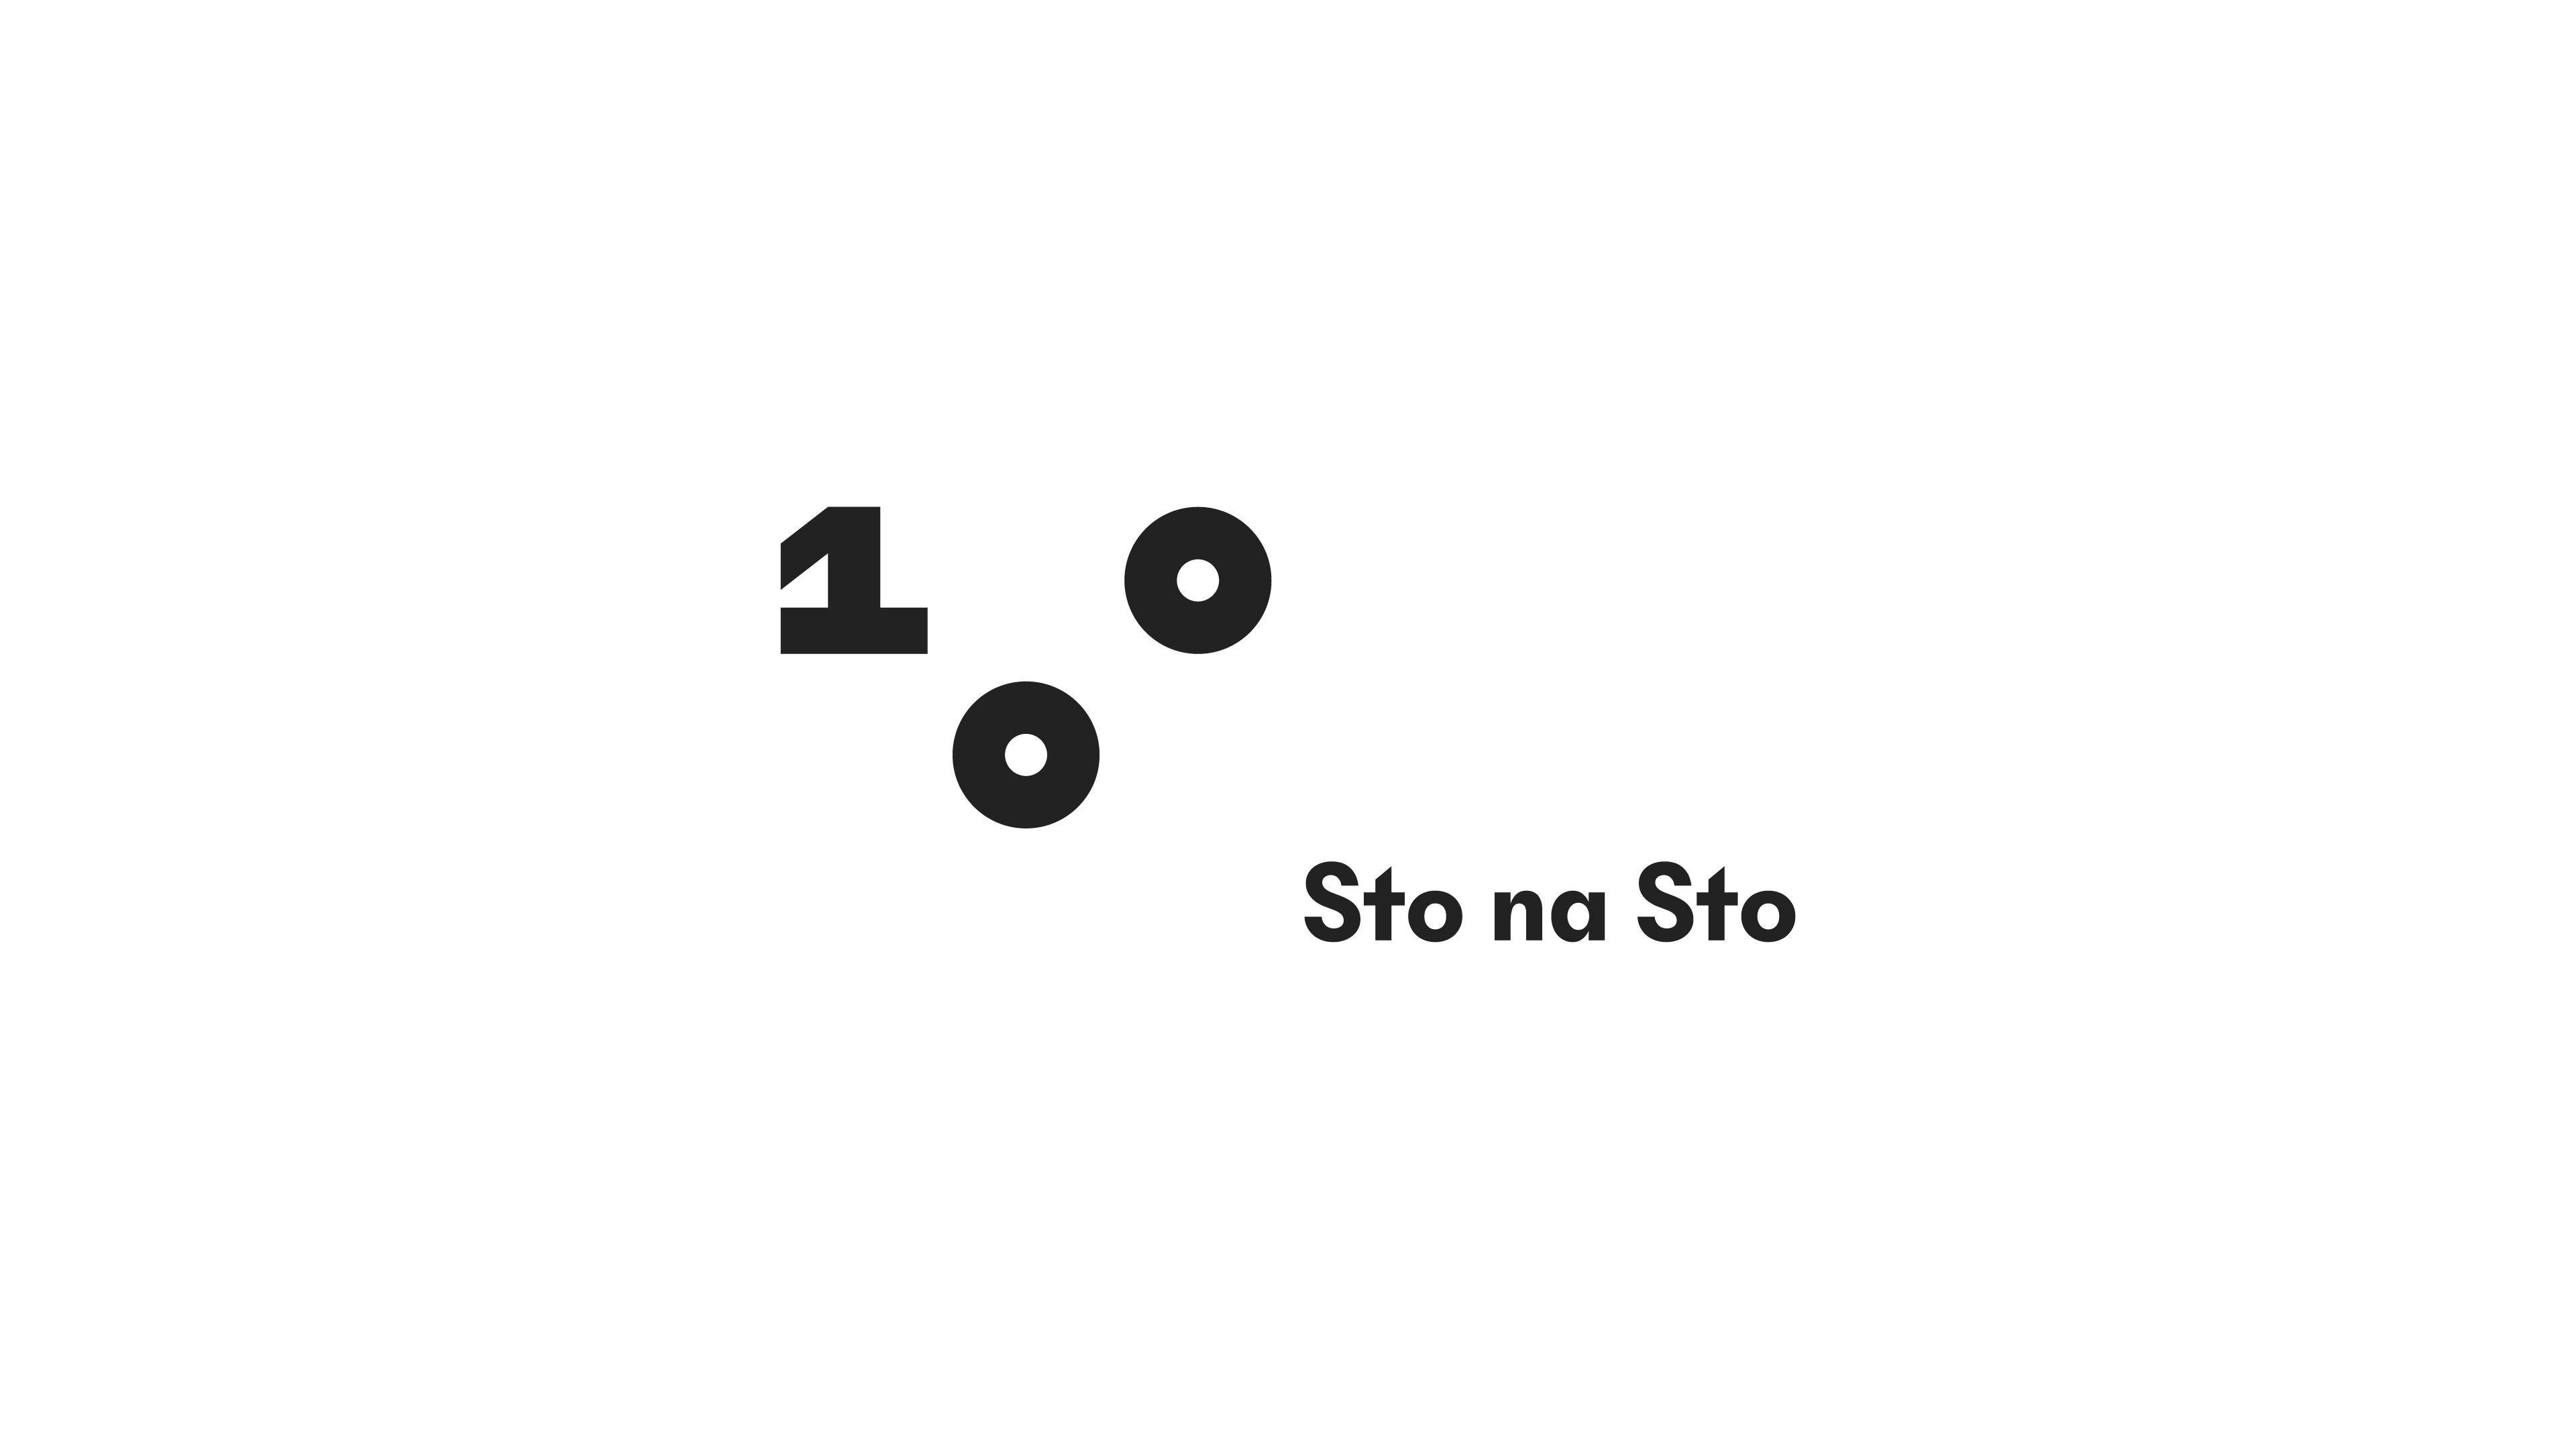 Sto na Sto (1st prize) - The Codeine Design